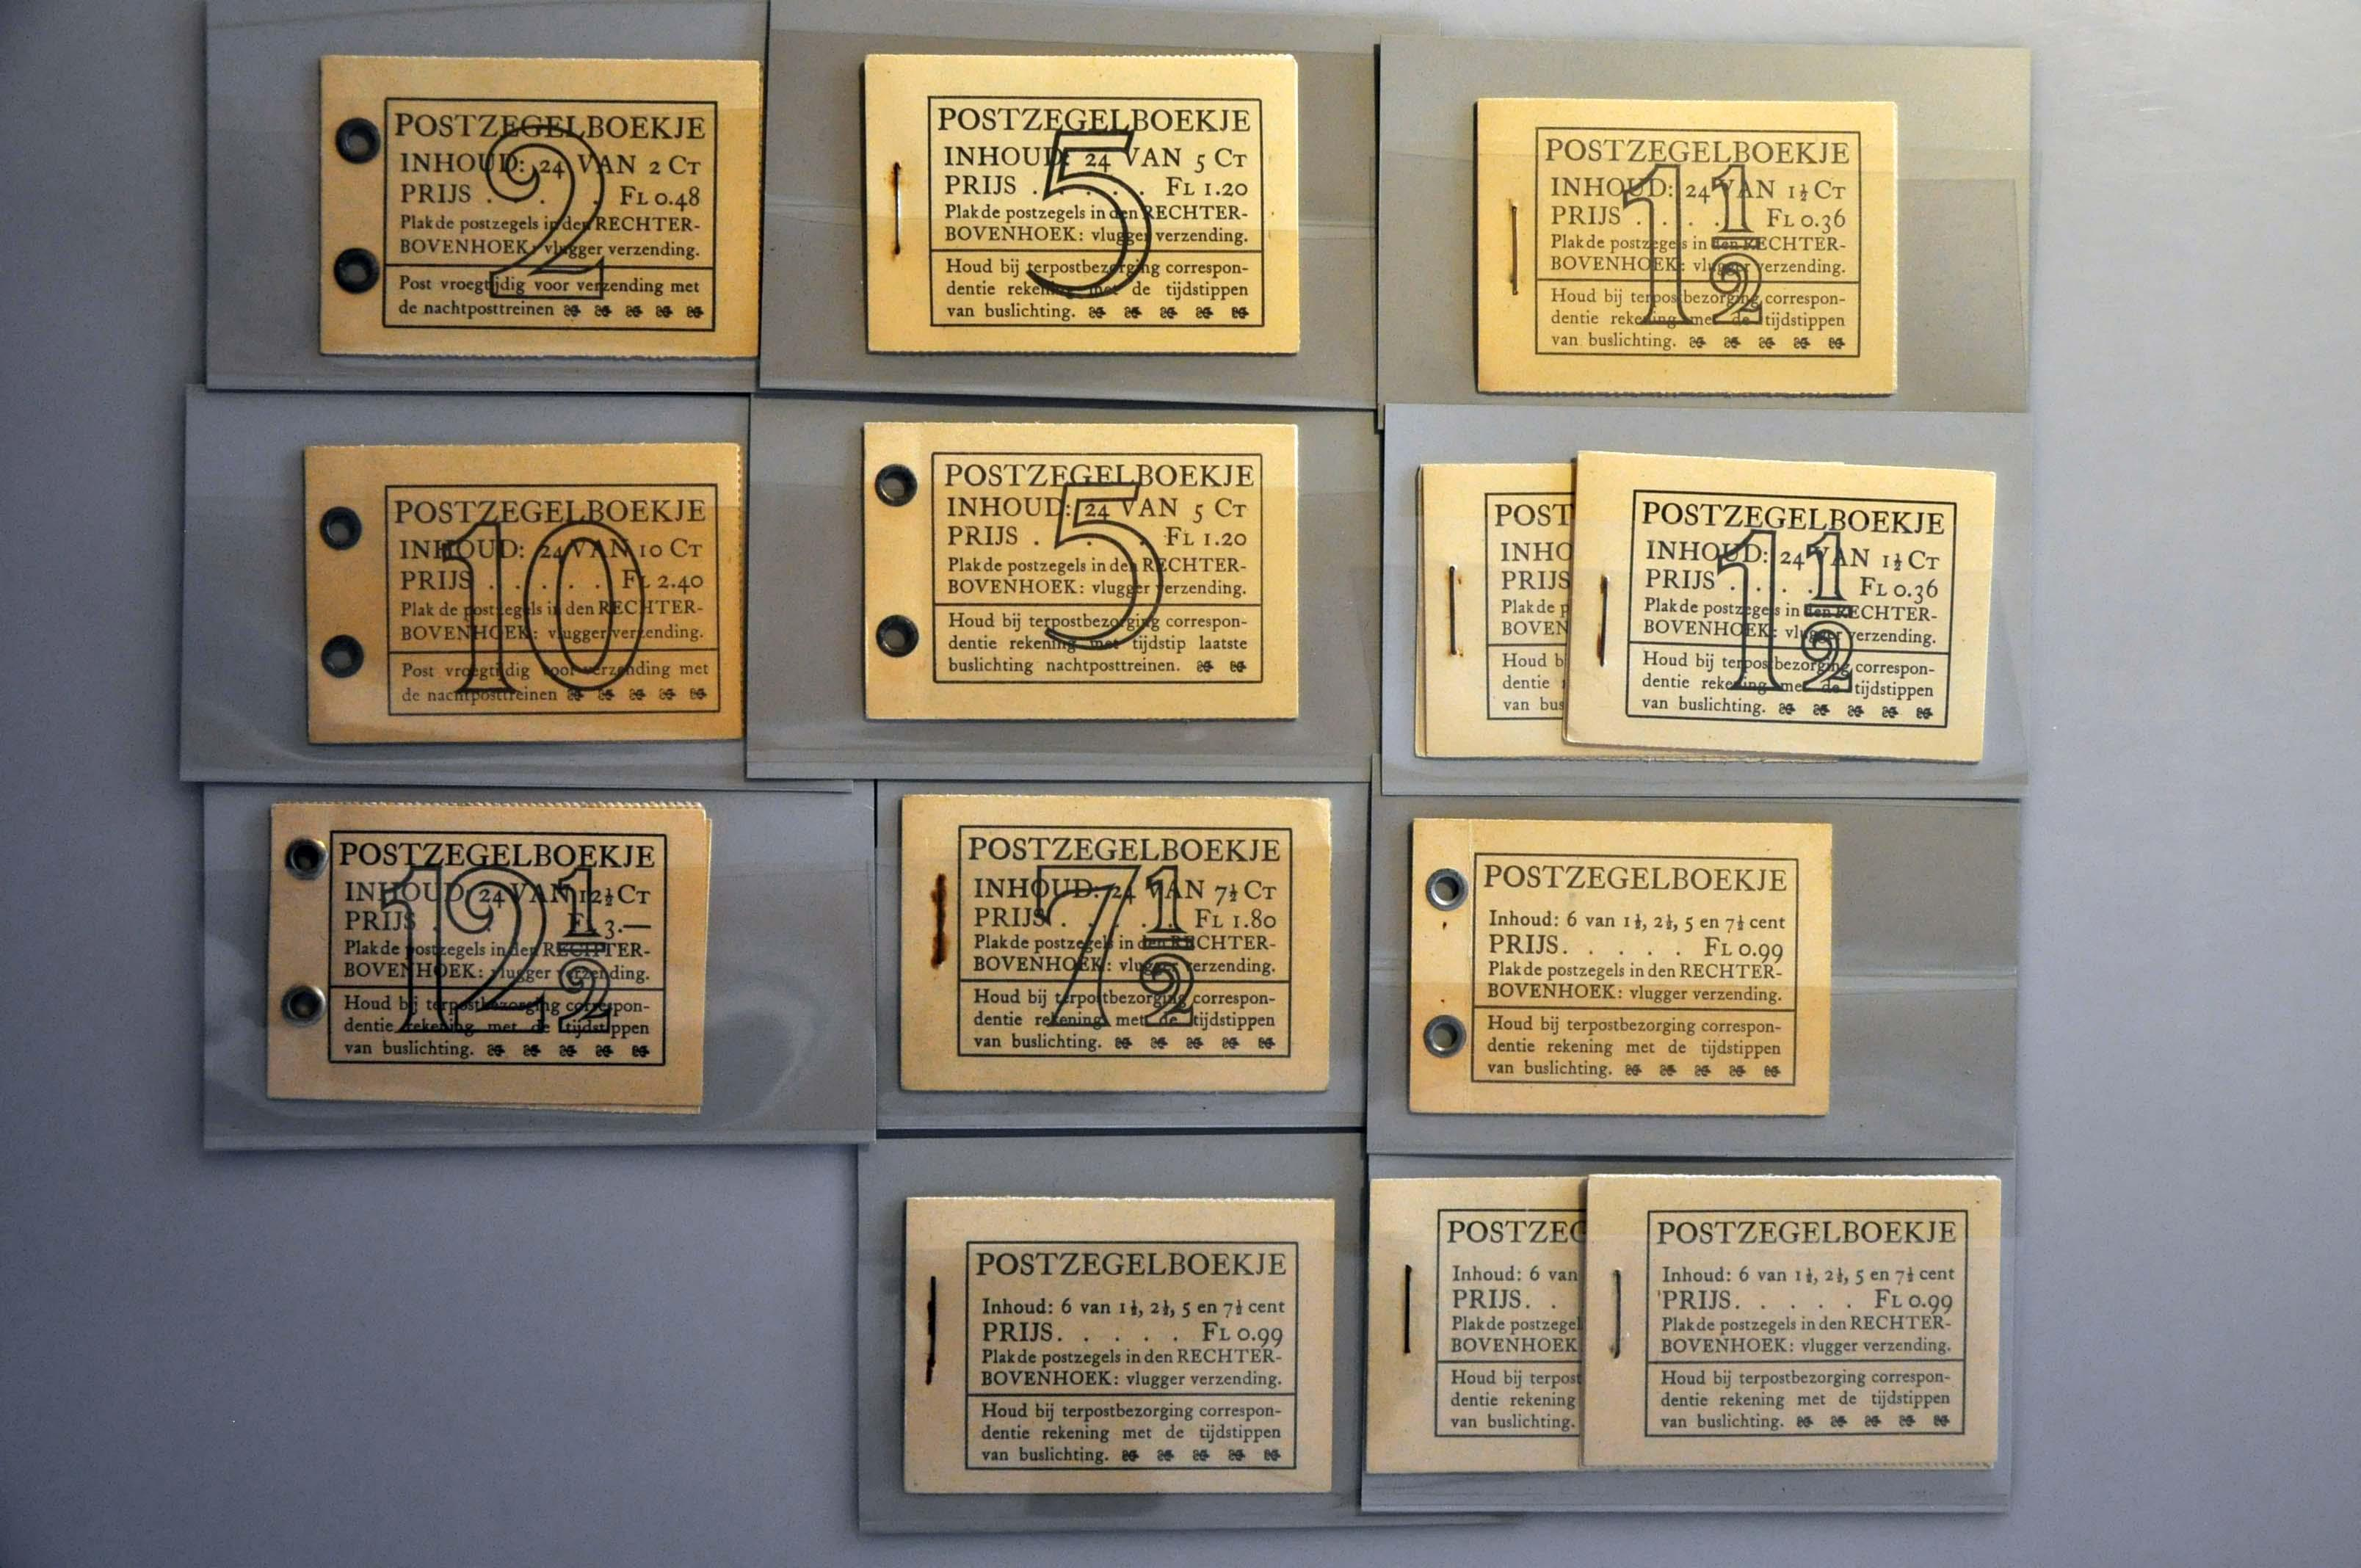 Lot 1990 - Netherlands and former colonies Netherlands -  Corinphila Veilingen Auction 239: General sale